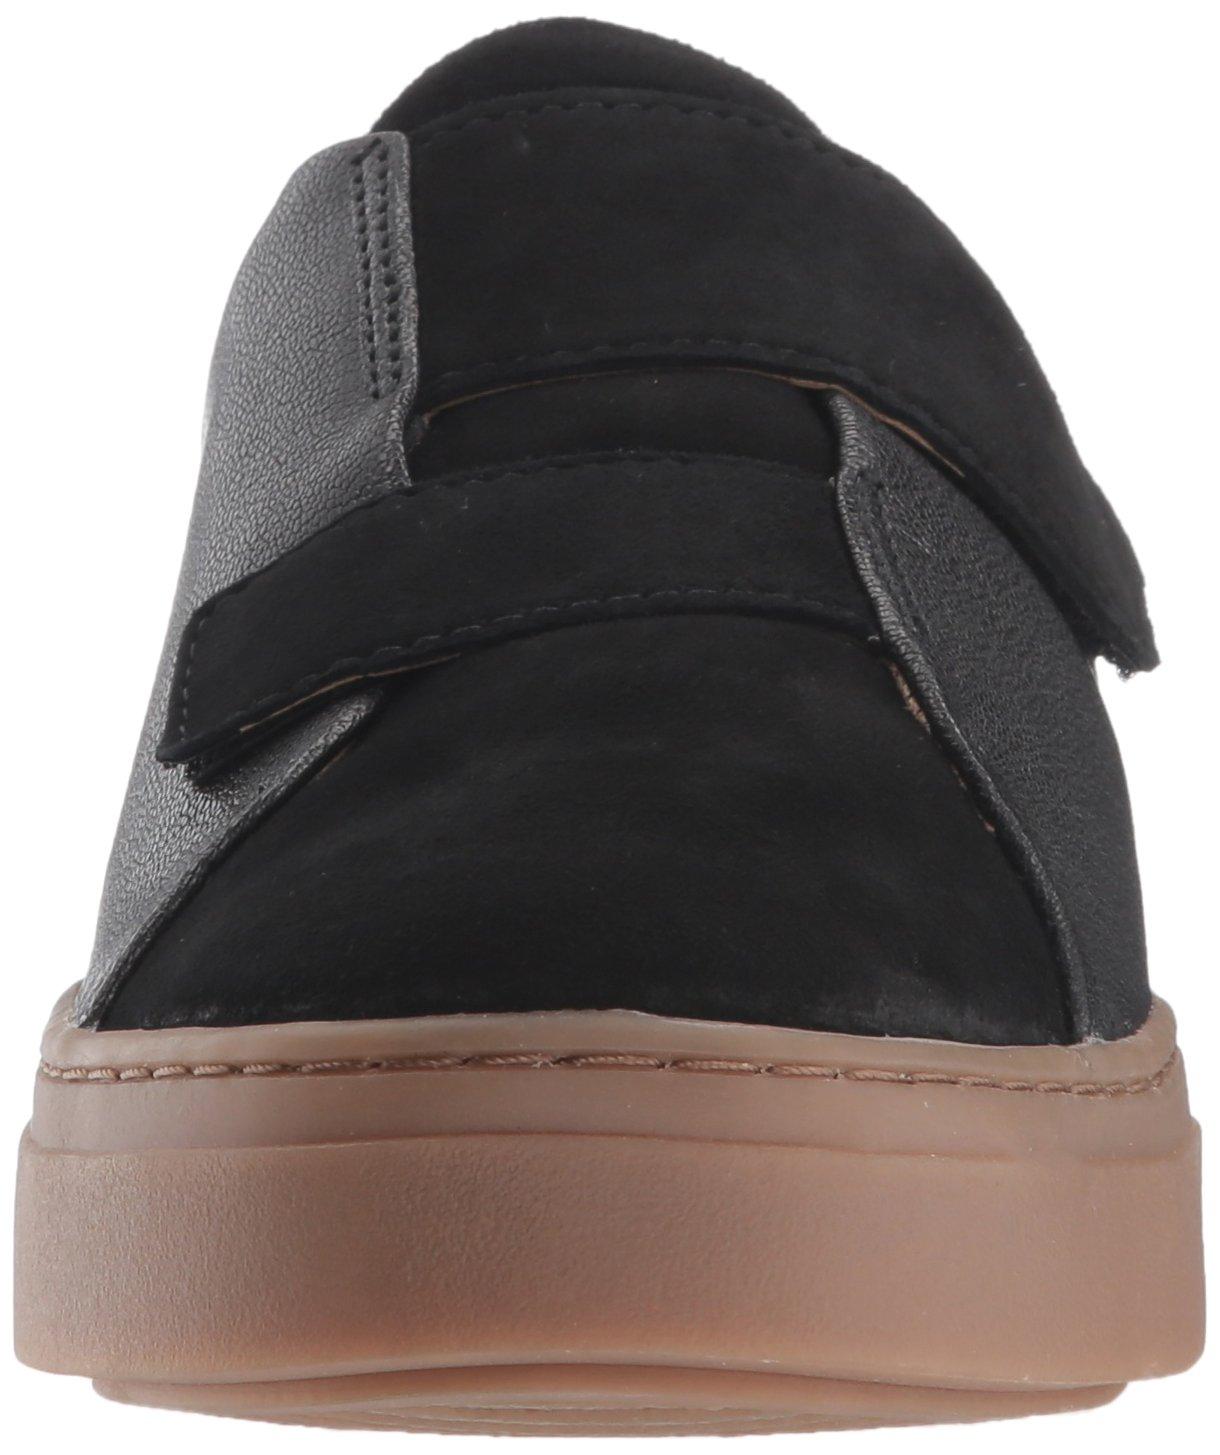 Naturalizer Women's Charlie Sneaker B072HHSHB2 7.5 B(M) US|Black